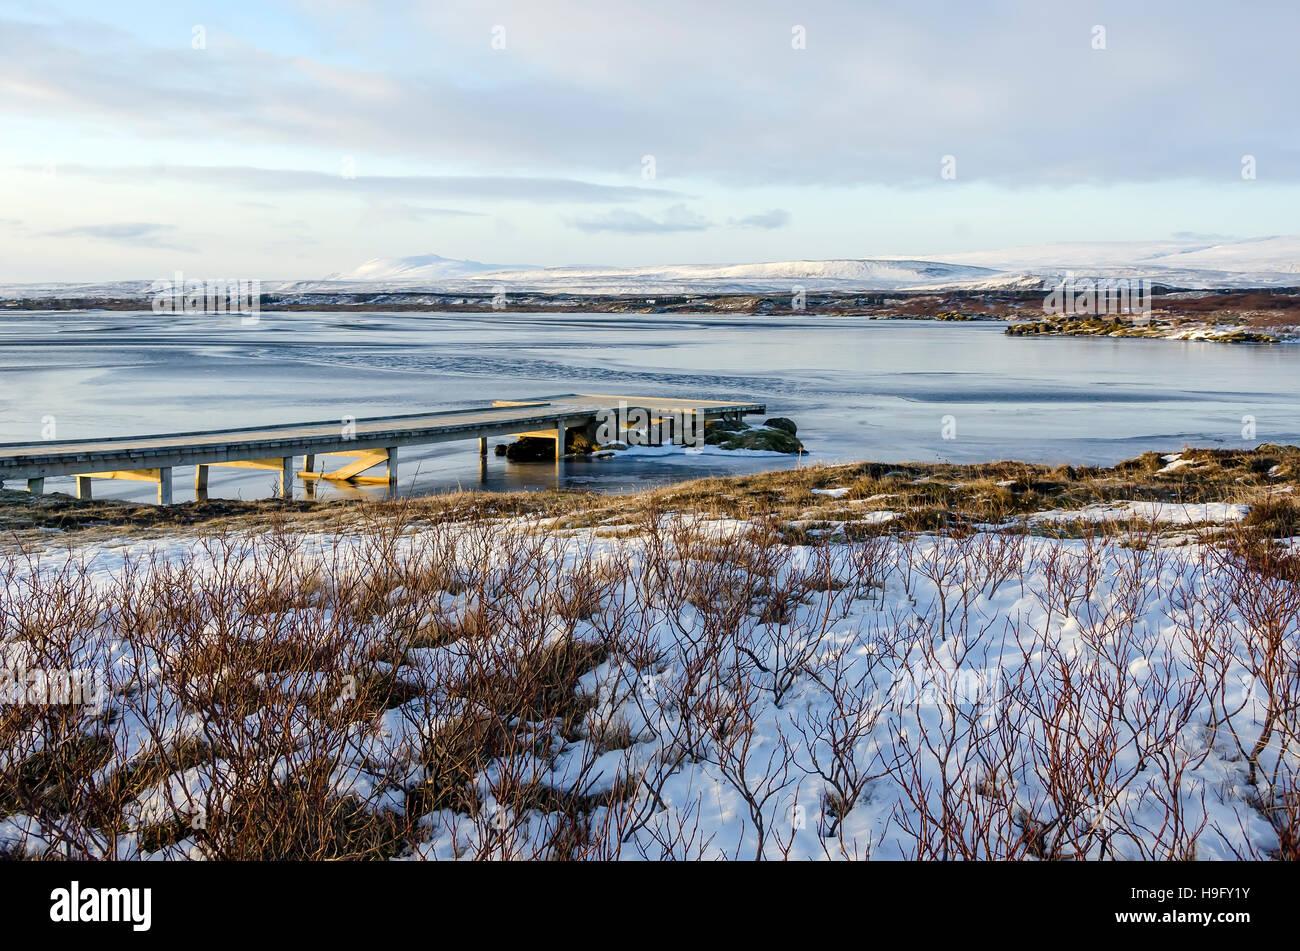 Deserted fishing pier winter at Thingvallavatan  Lake, Iceland Golden Circle Tour Thingvellir (Þingvellir) - Stock Image